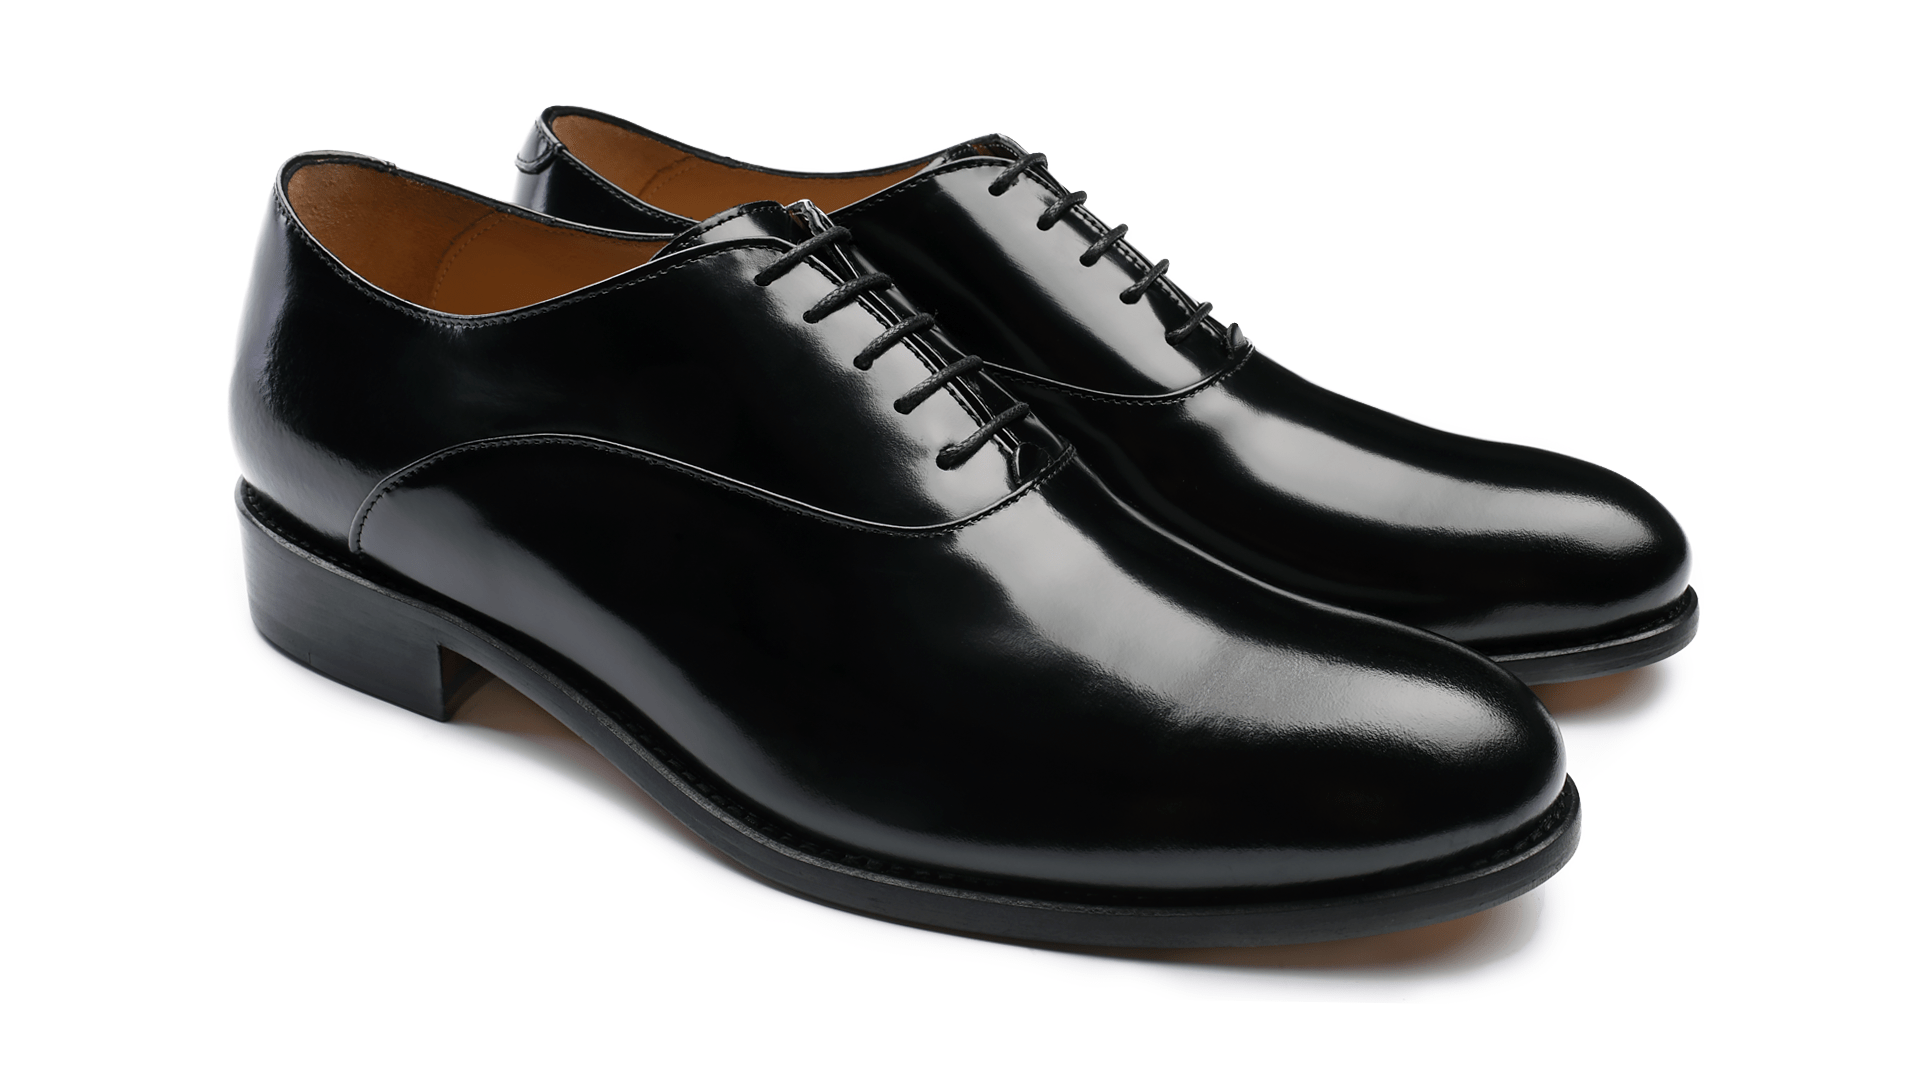 Oxford Plain Toe Polished Black Calf